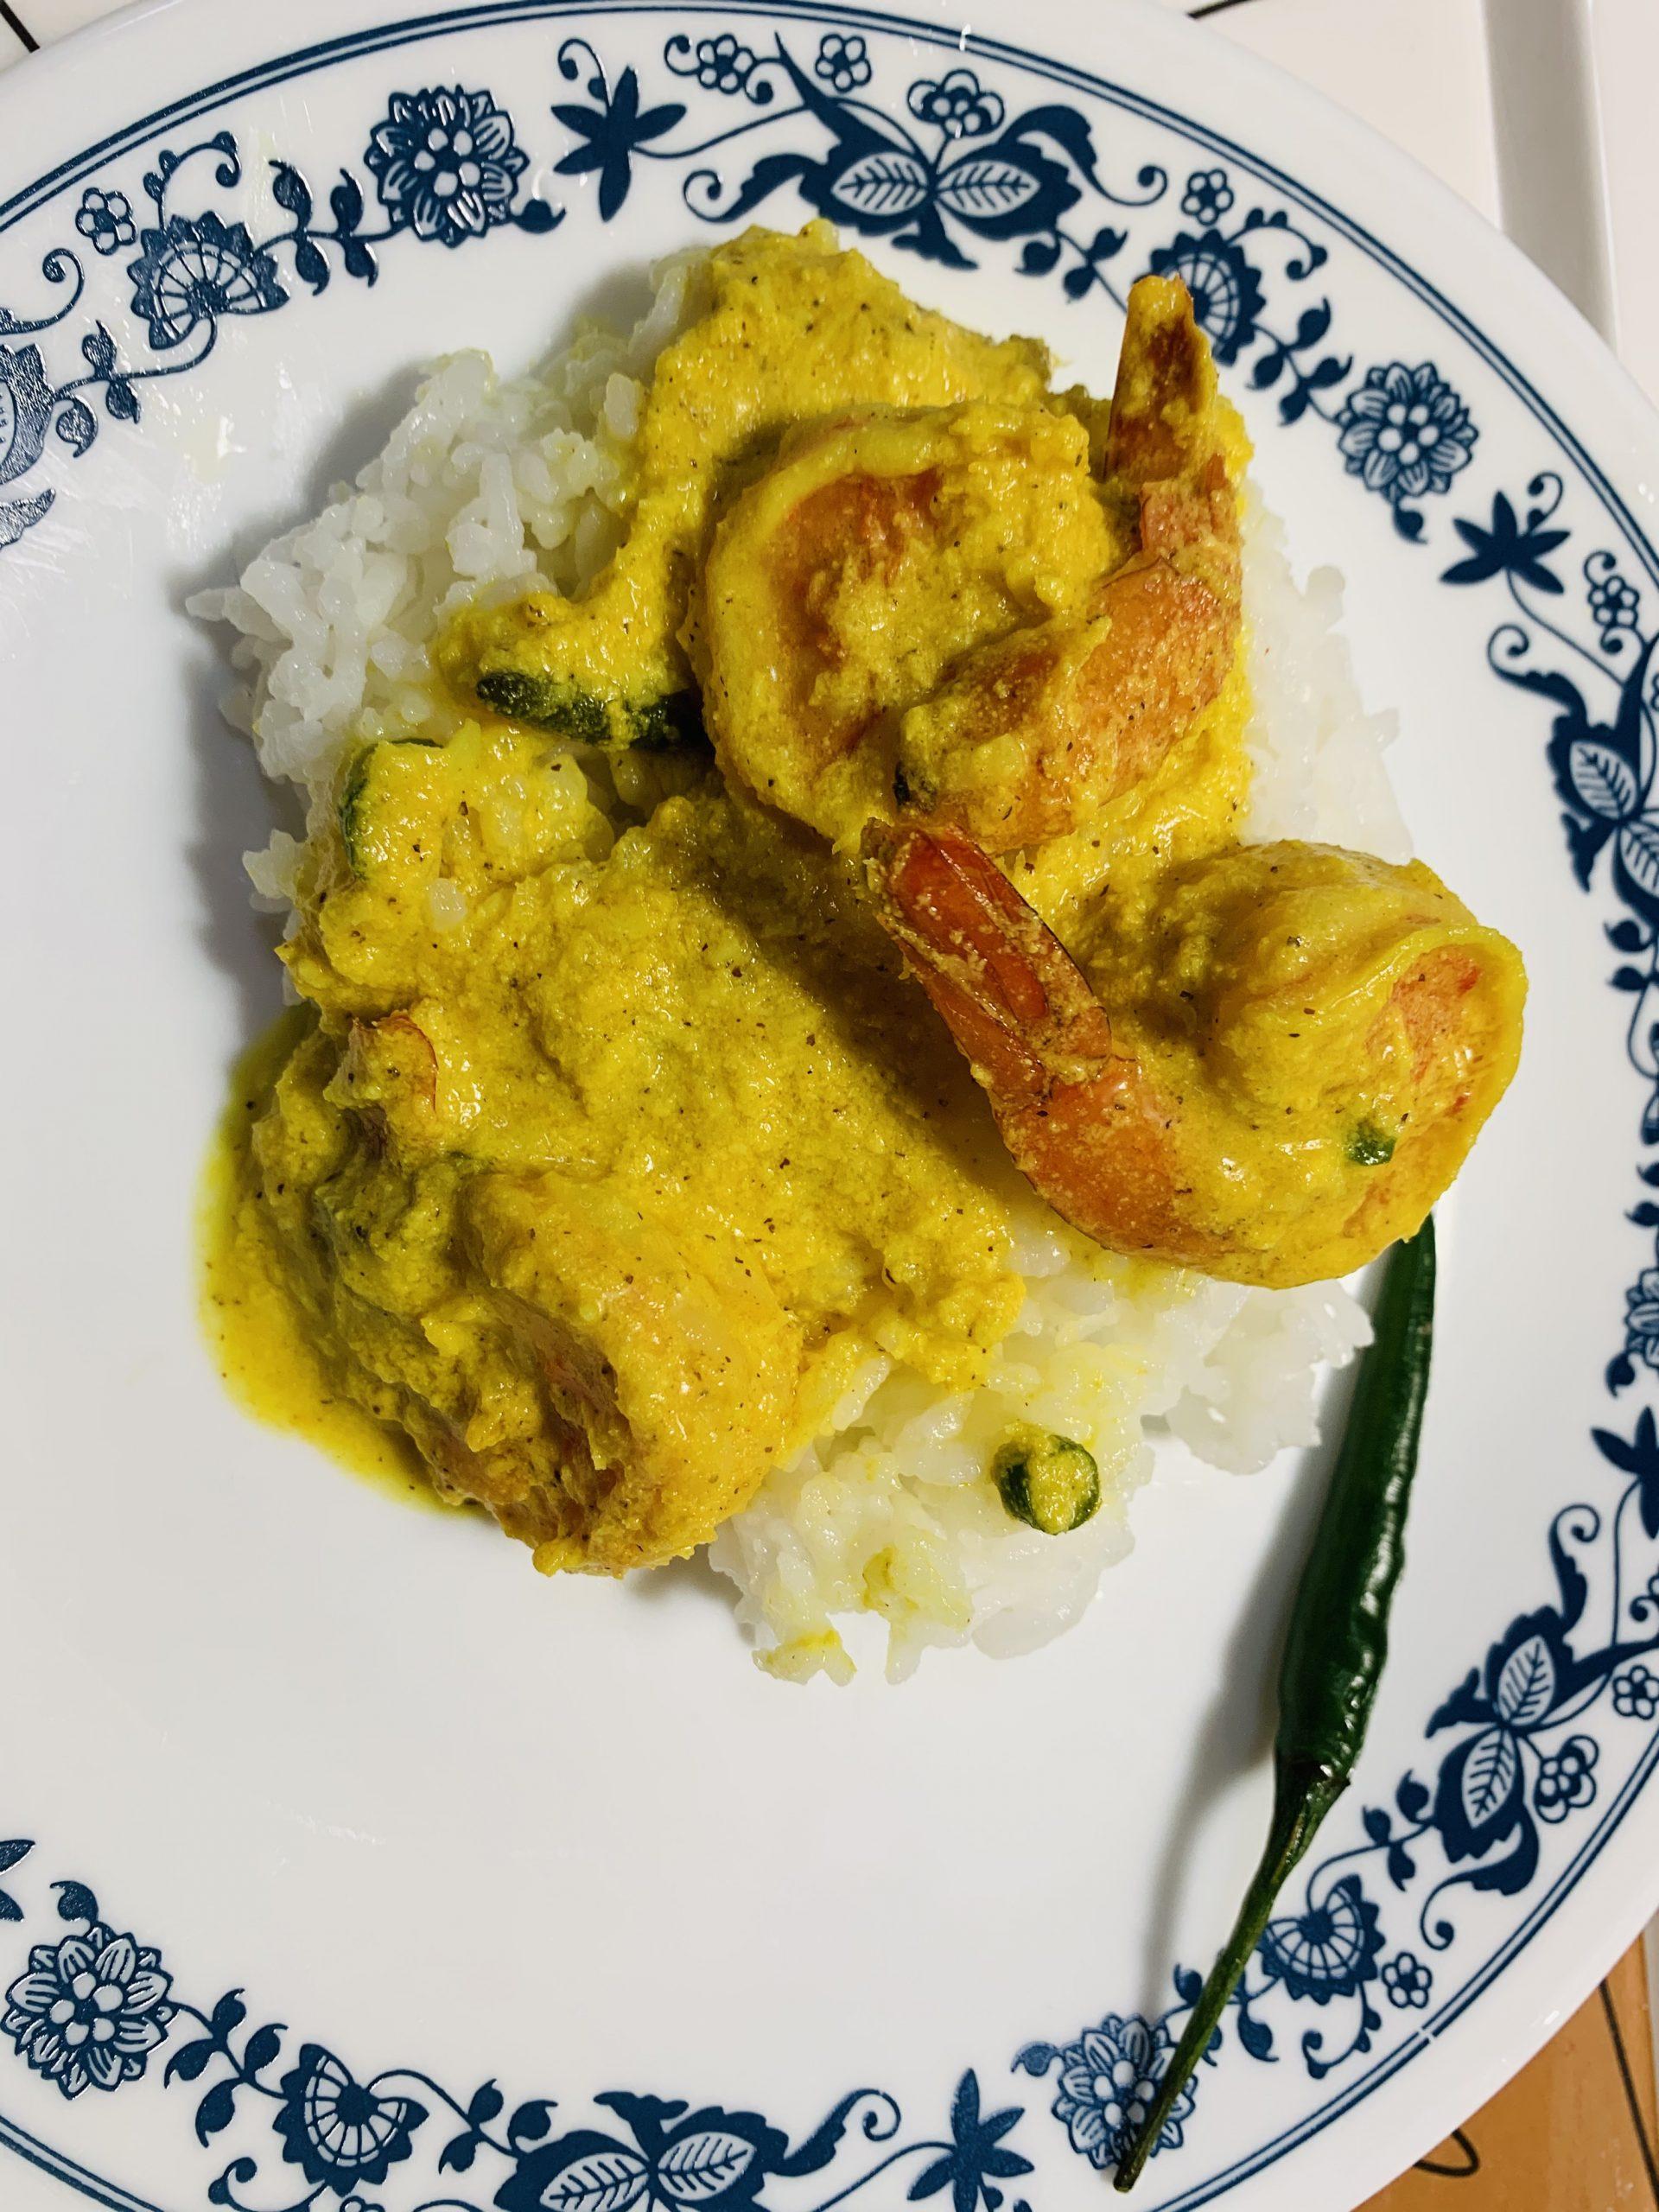 Steamed Shrimp in Yogurt-Mustard Sauce (Bhapa Chingri)